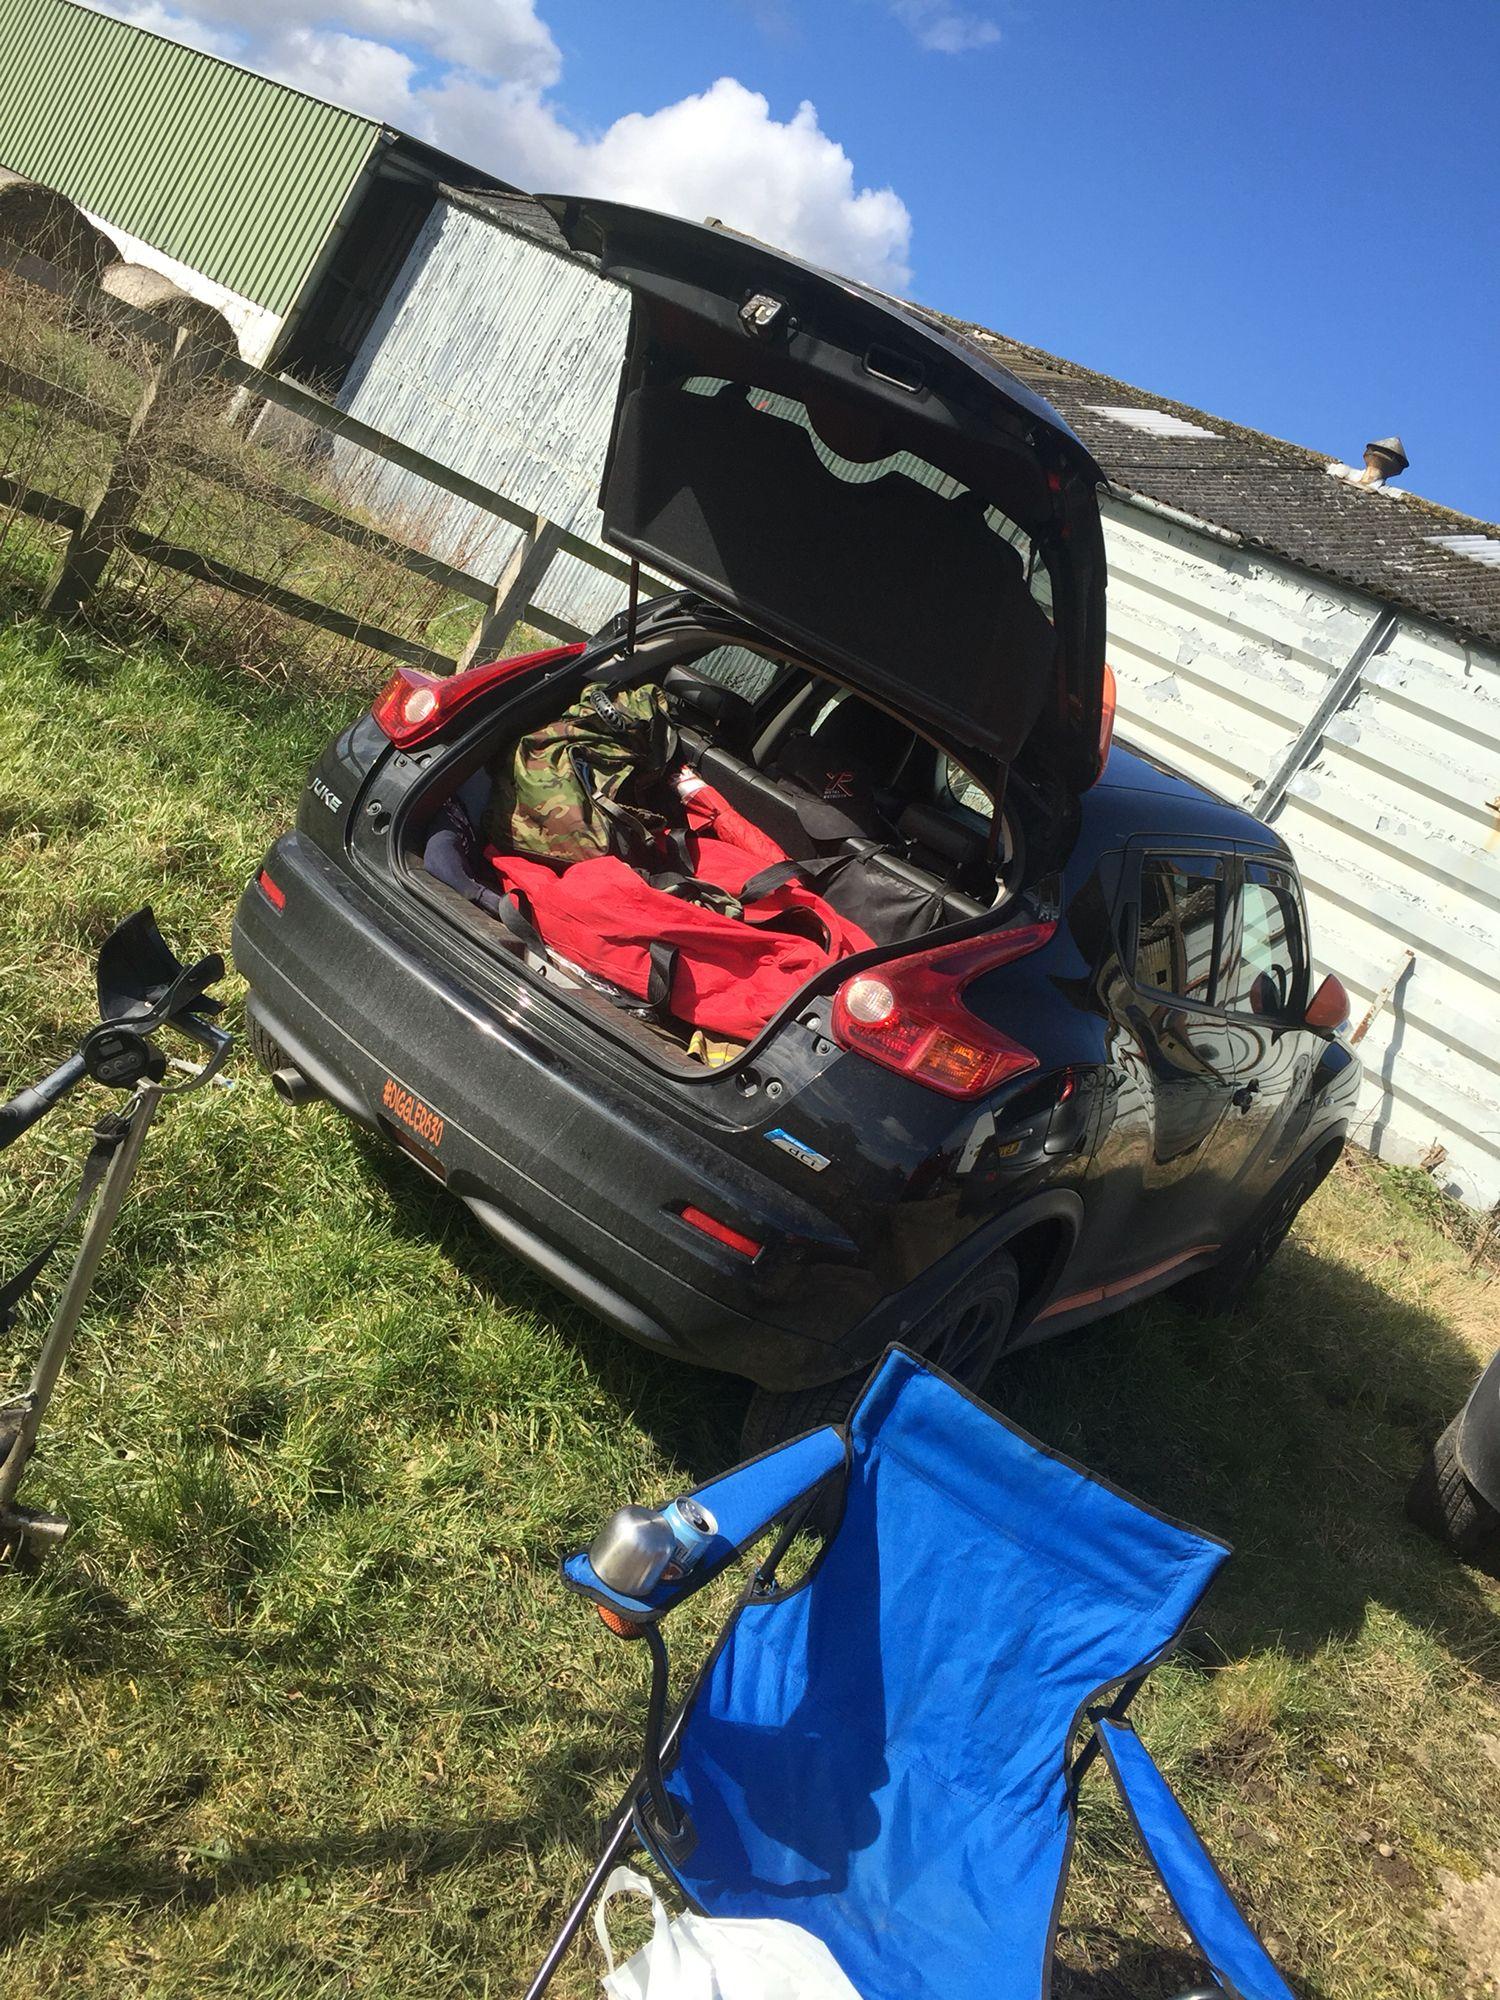 Setting up camp, #juke #diggler630 | V R O O M | Nissan juke